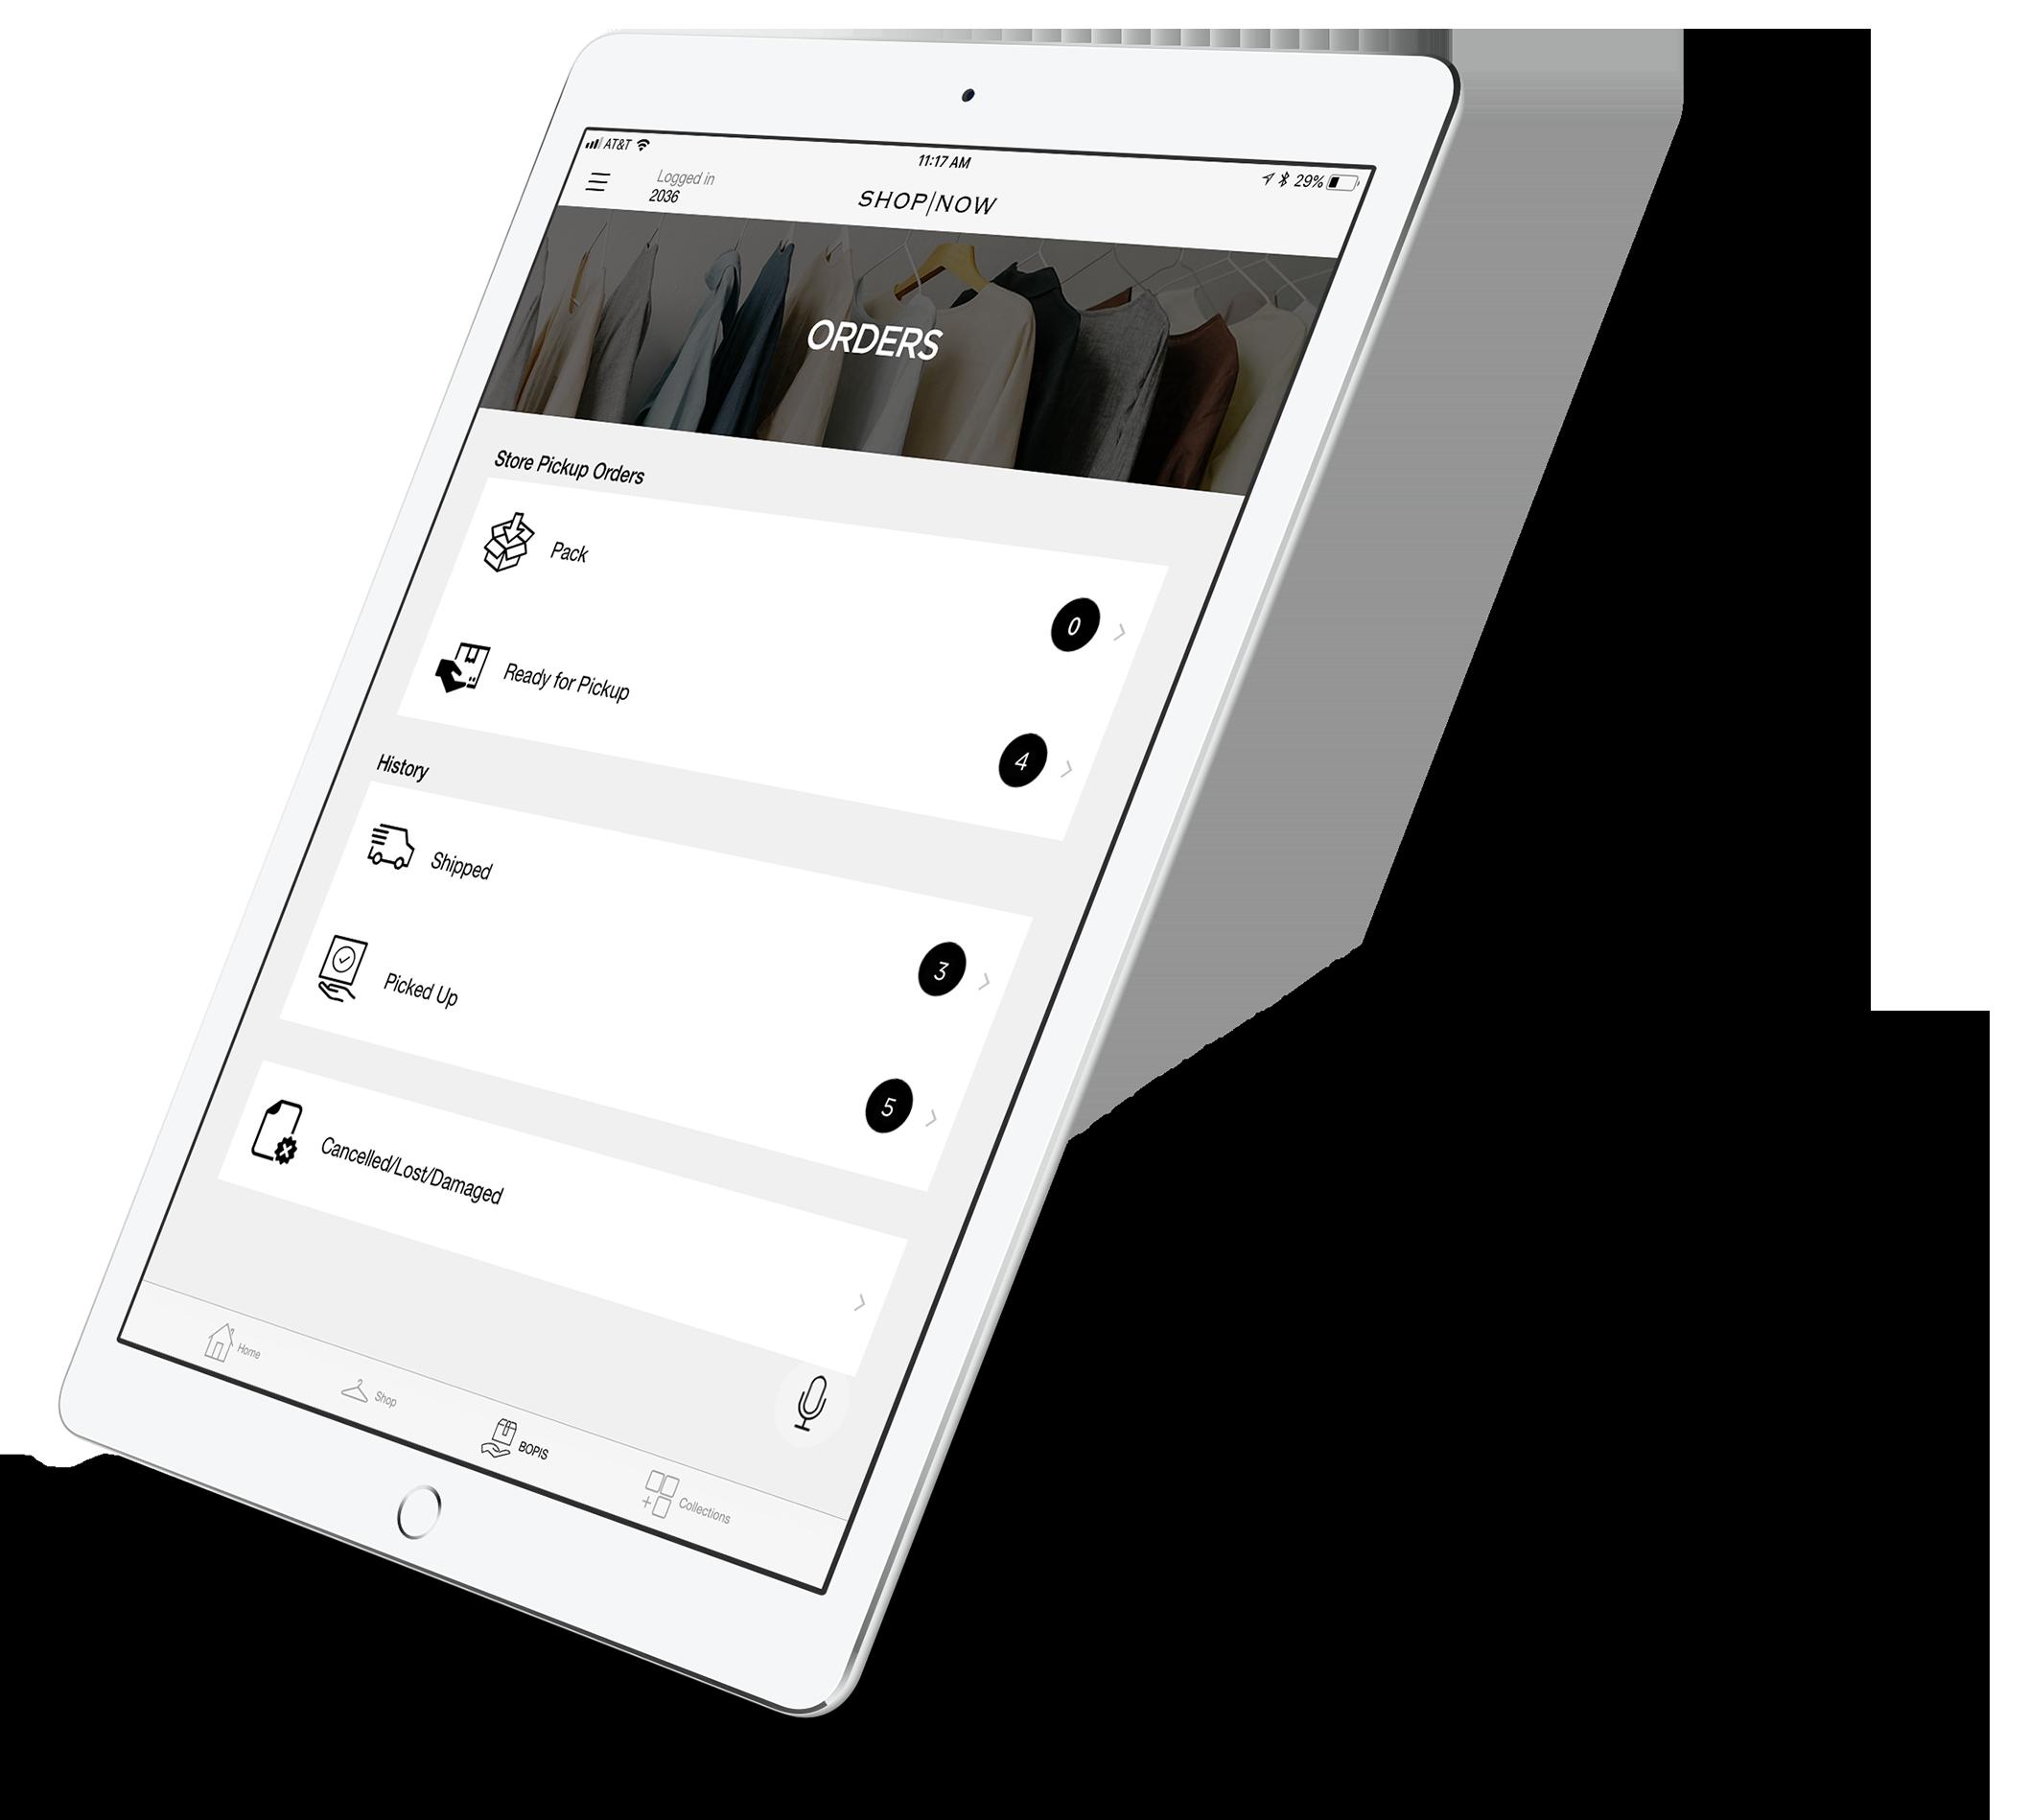 BOPIS App for Retail Associates by PredictSpring